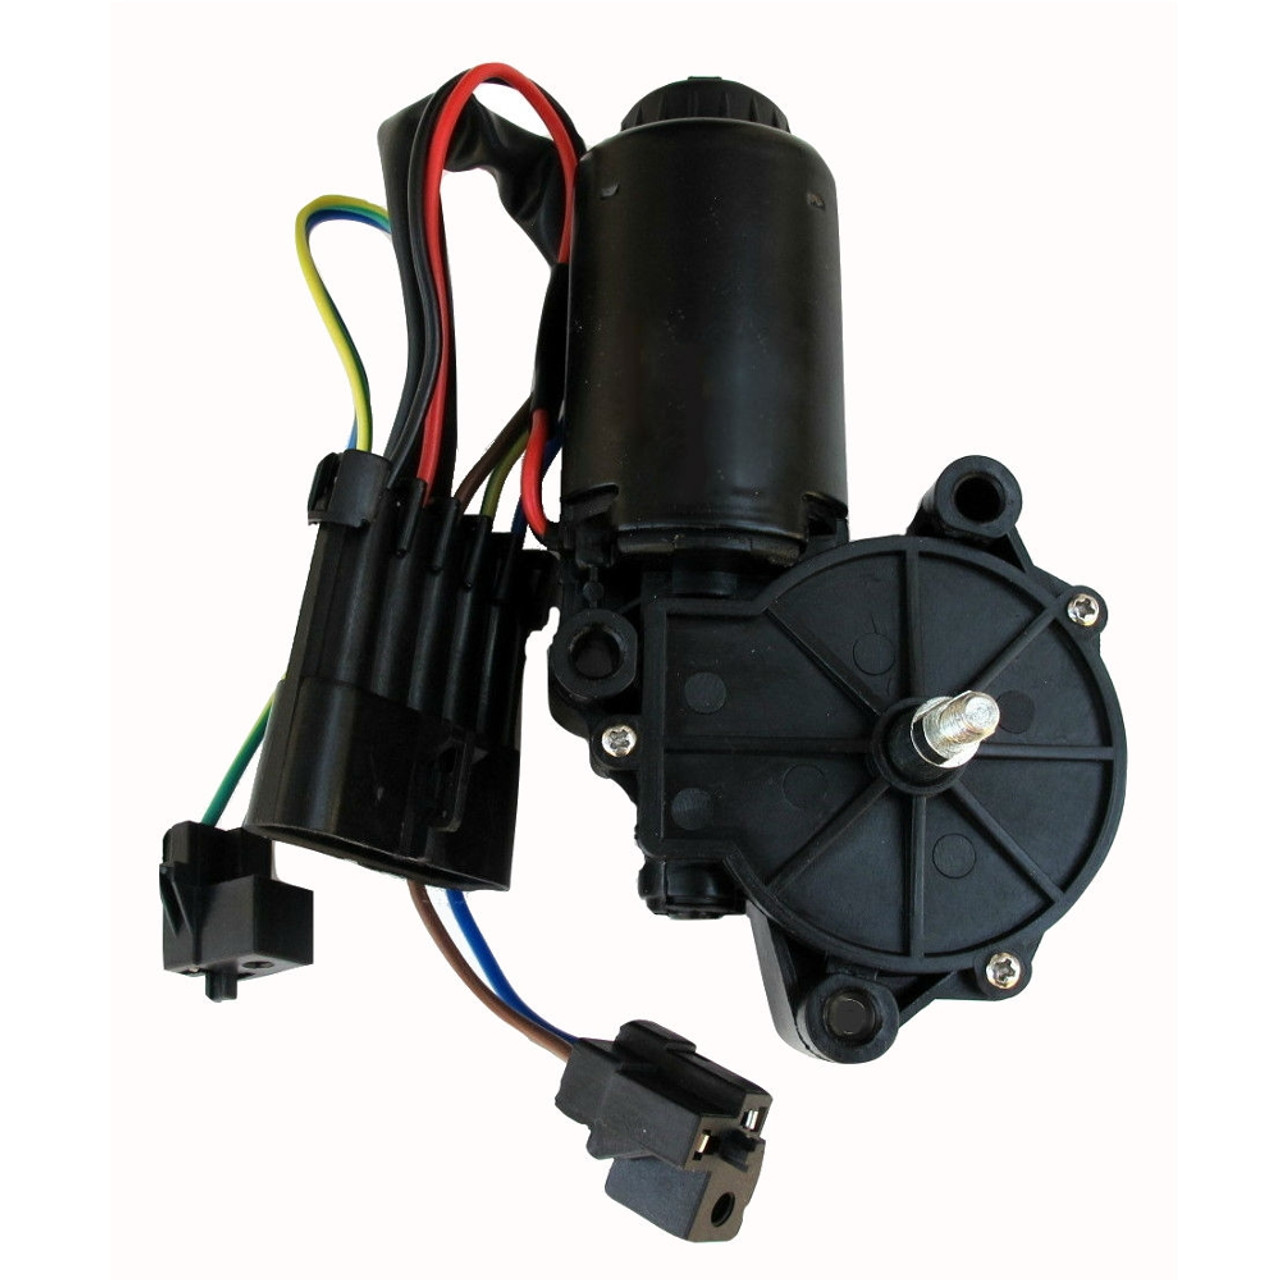 medium resolution of new 1998 2002 firebird headlight actuator motor wire harness lh westcoast autoparts com